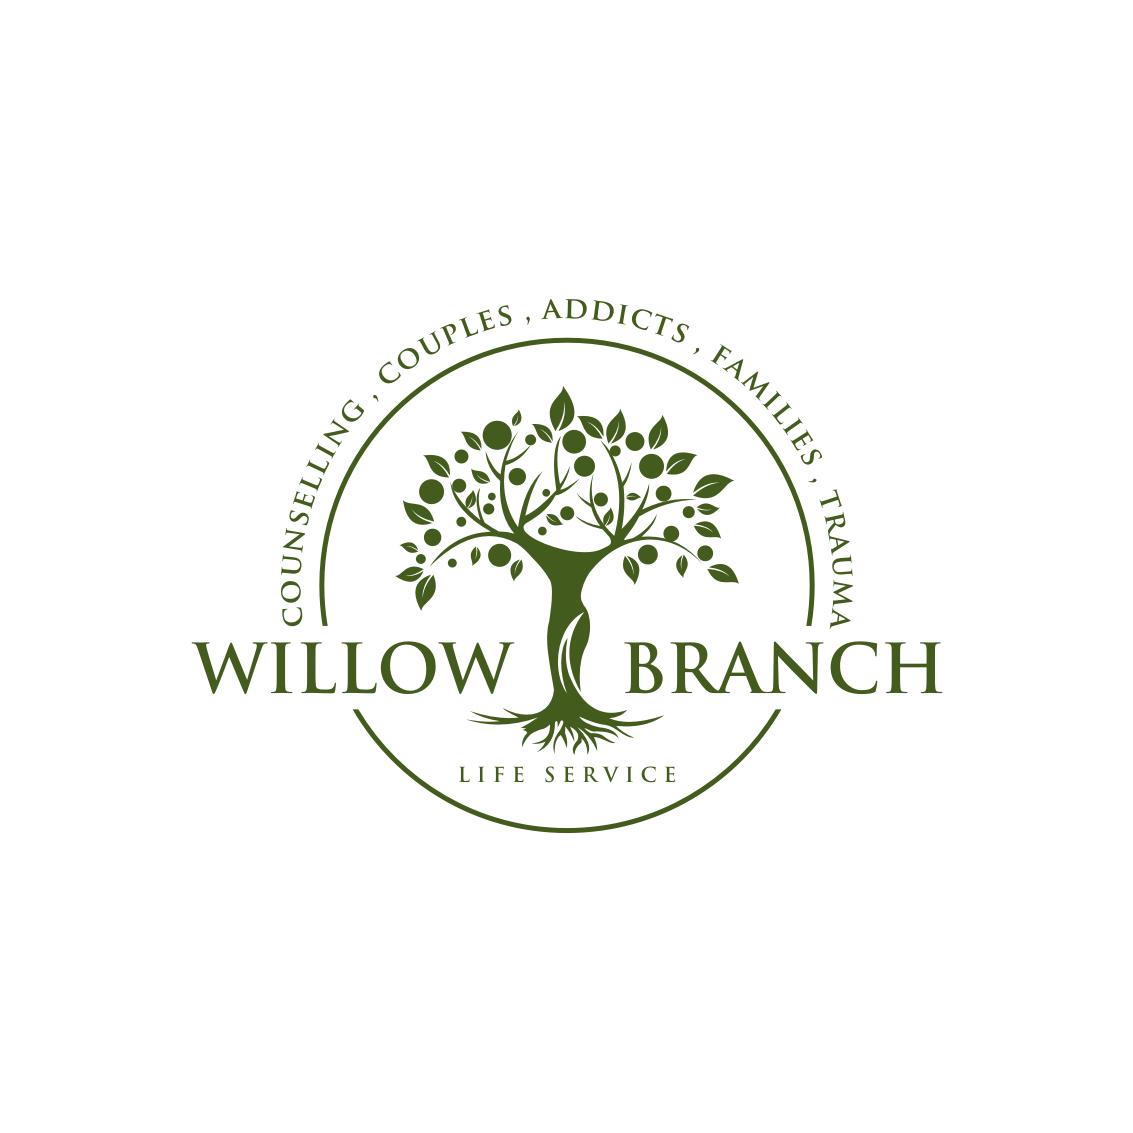 Logo Design by Analla Art - Entry No. 90 in the Logo Design Contest Artistic Logo Design for Willow Branch Life Service.